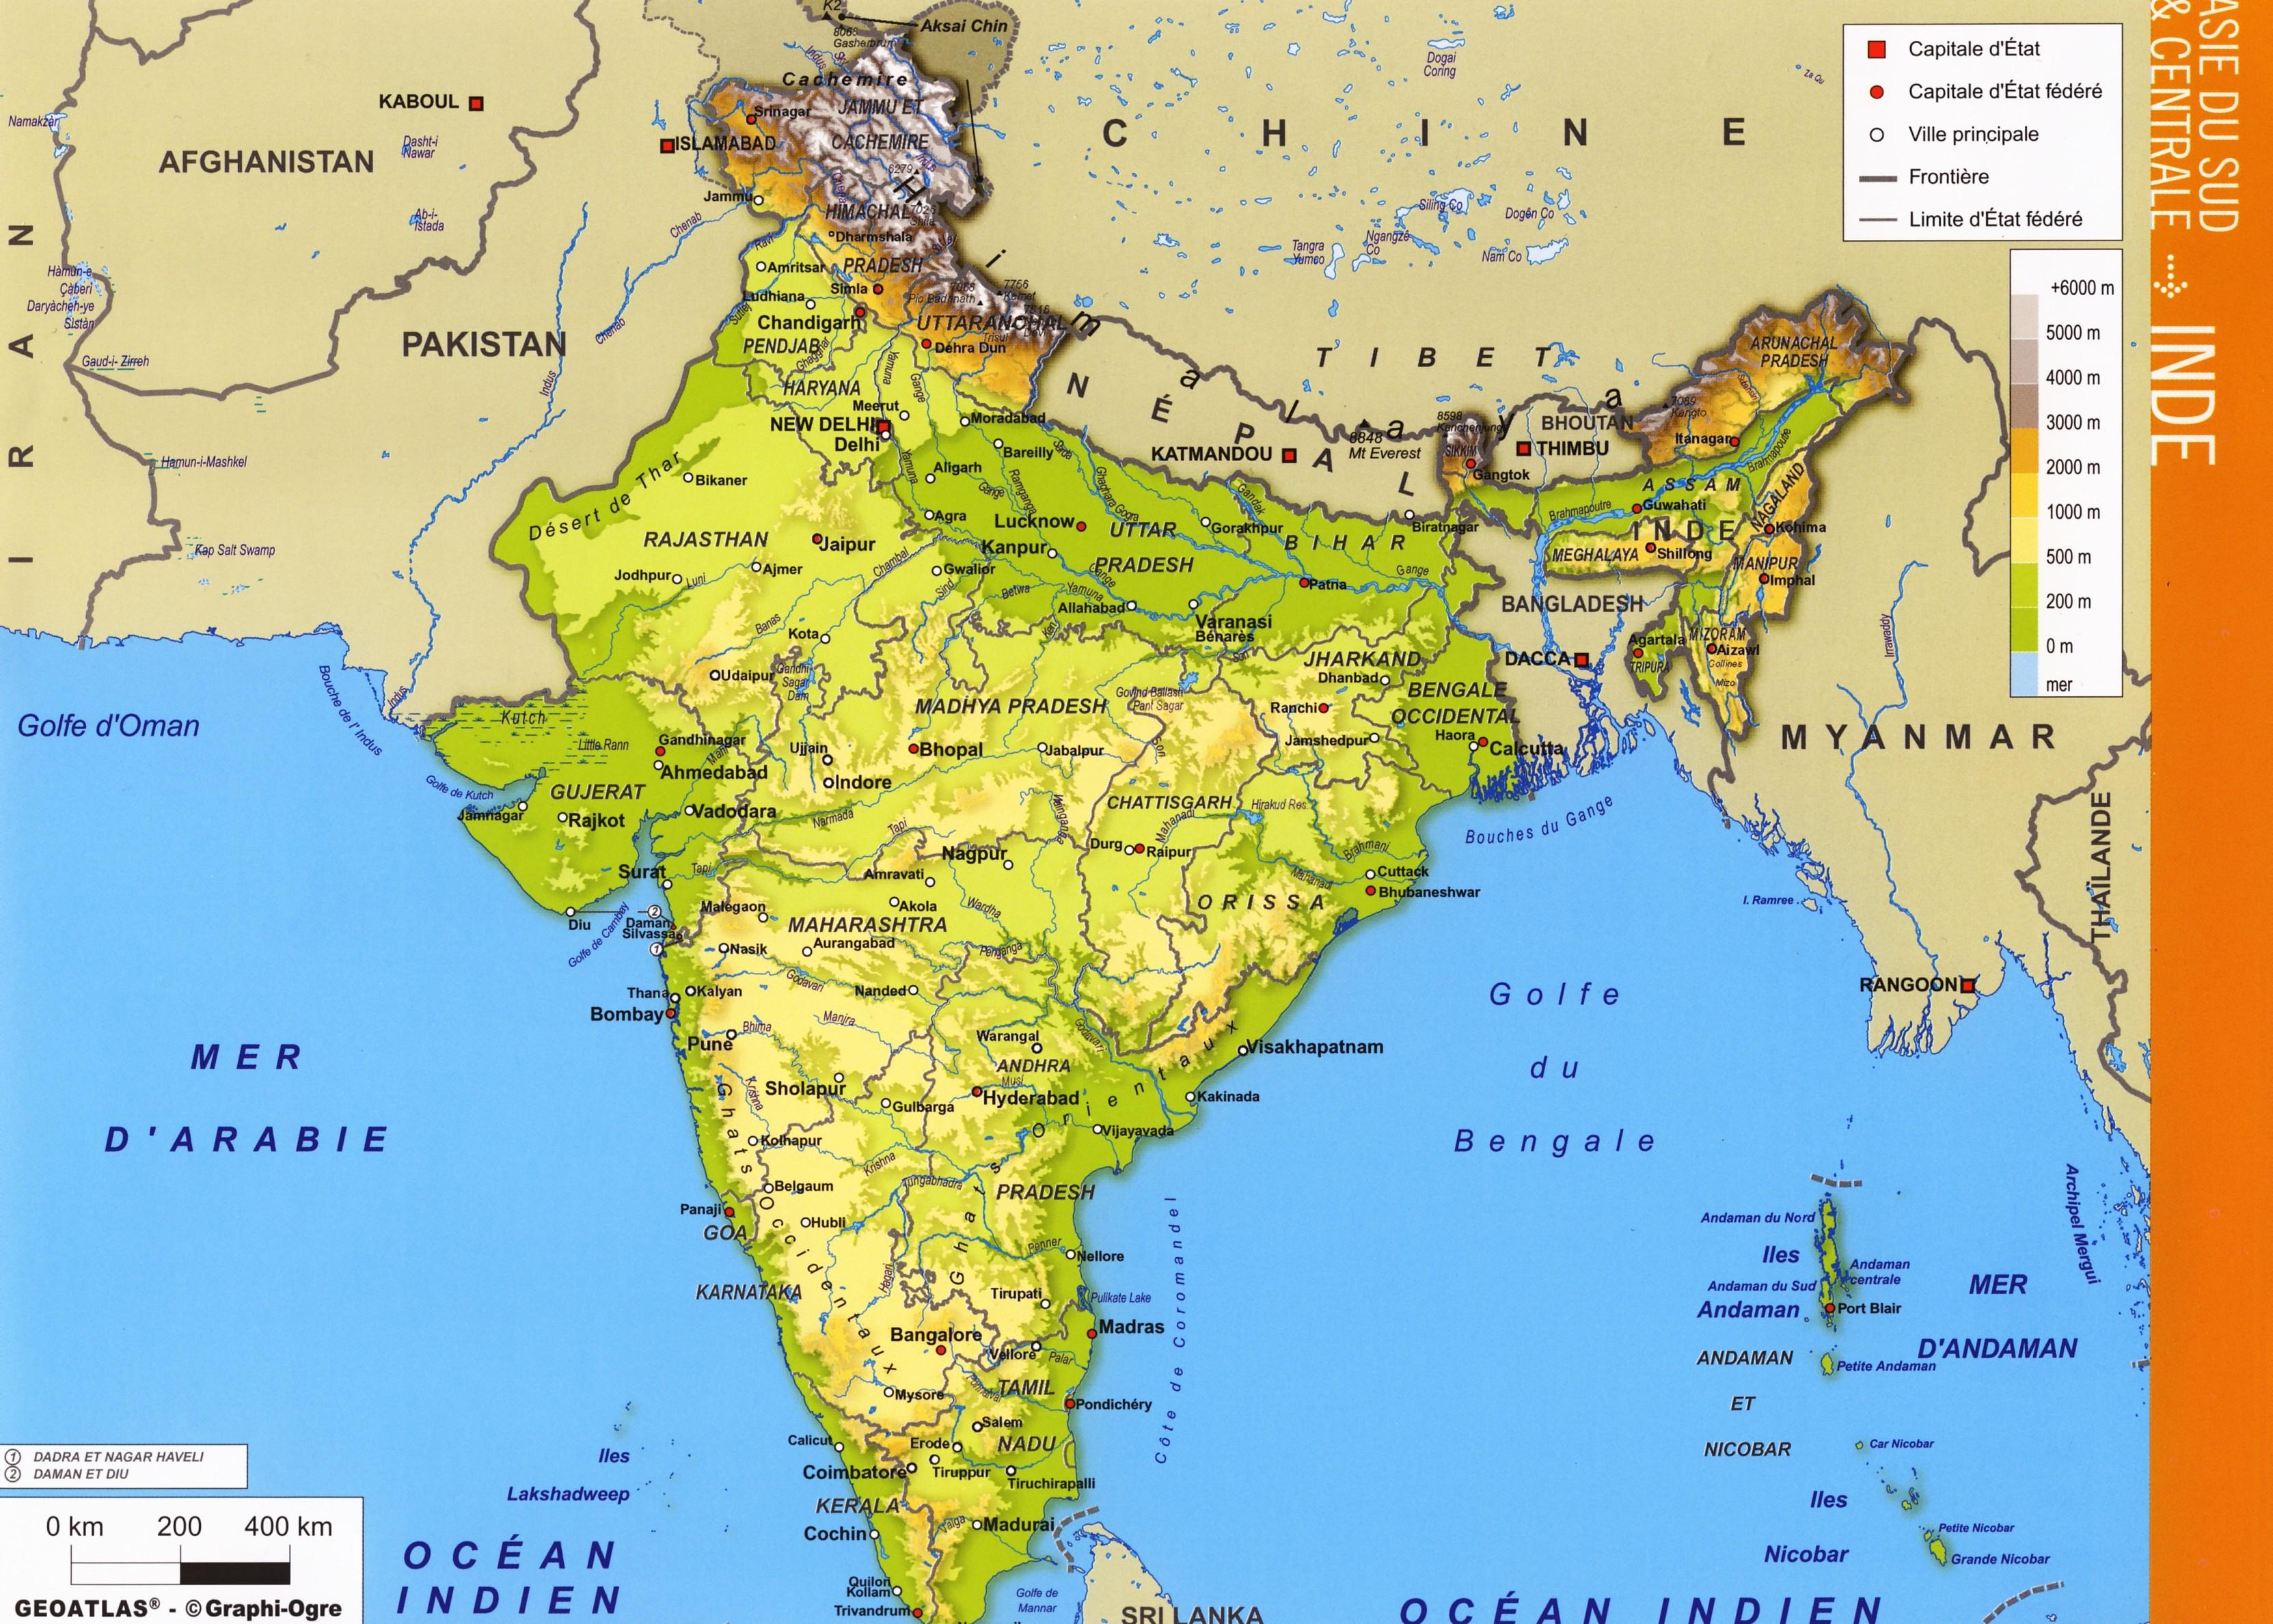 Carte De Linde A Imprimer.Carte De L Inde A Imprime Et Completer